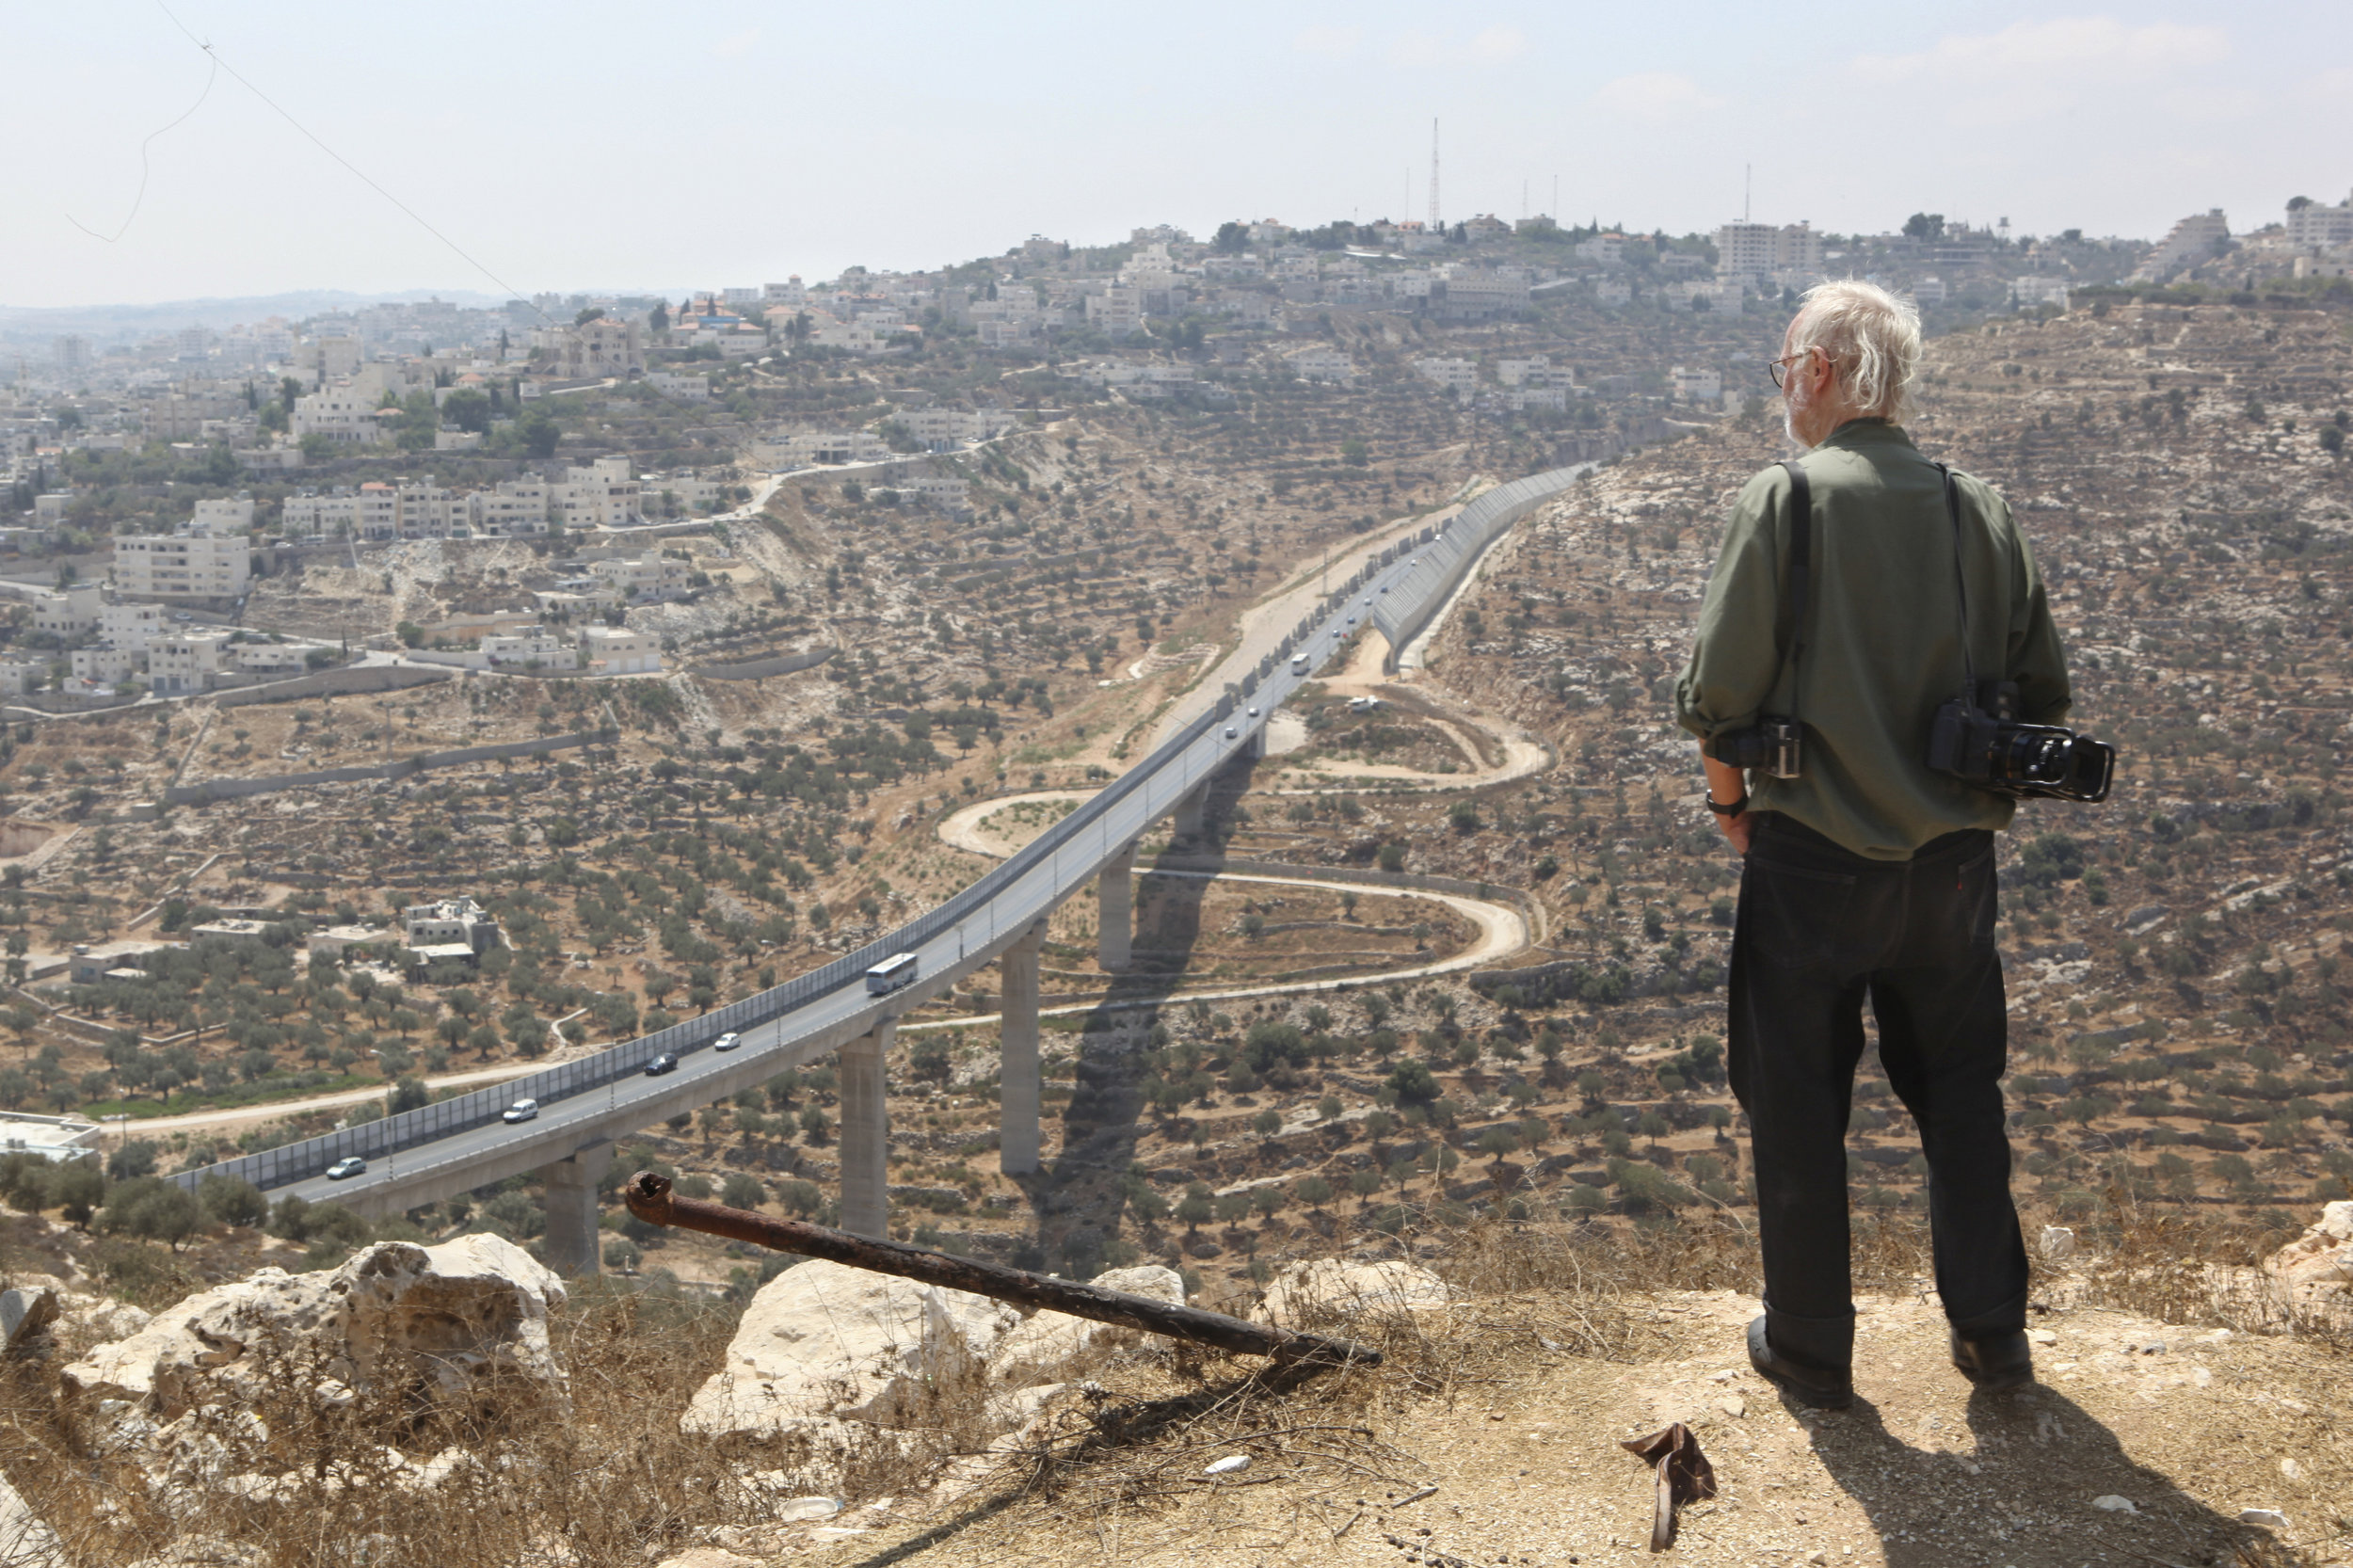 Koudelka - Shooting Holy Land - Read more